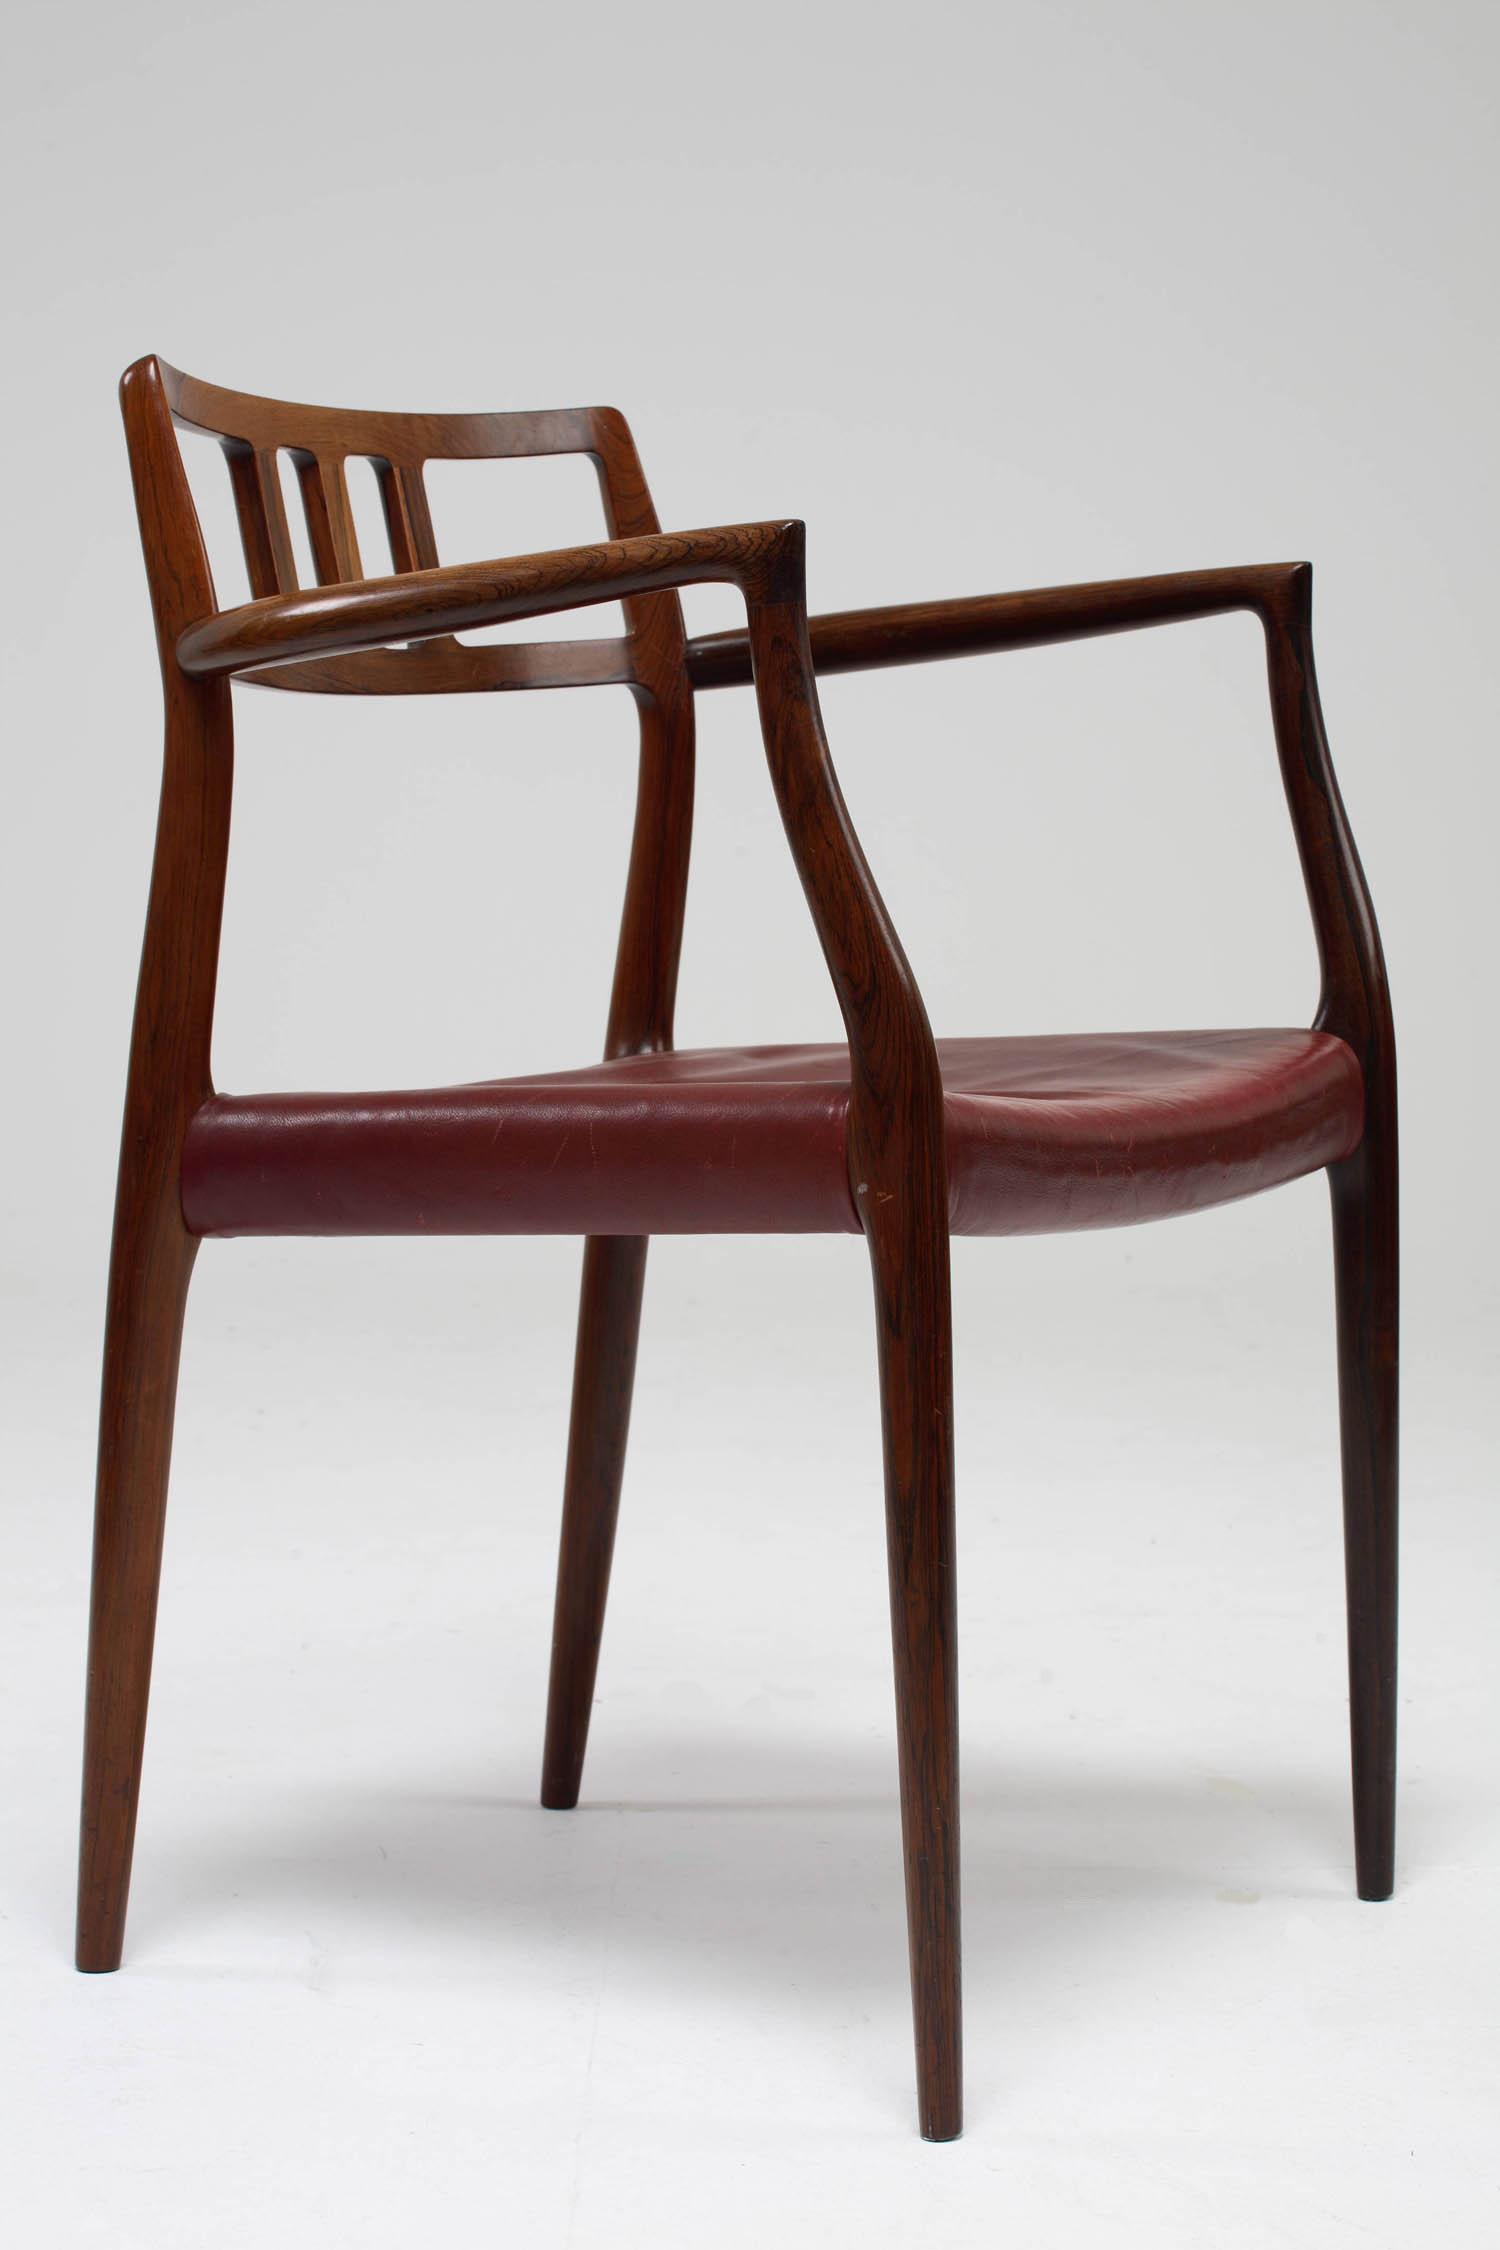 N O Moller 1966 Carver   • made 1966-90  •